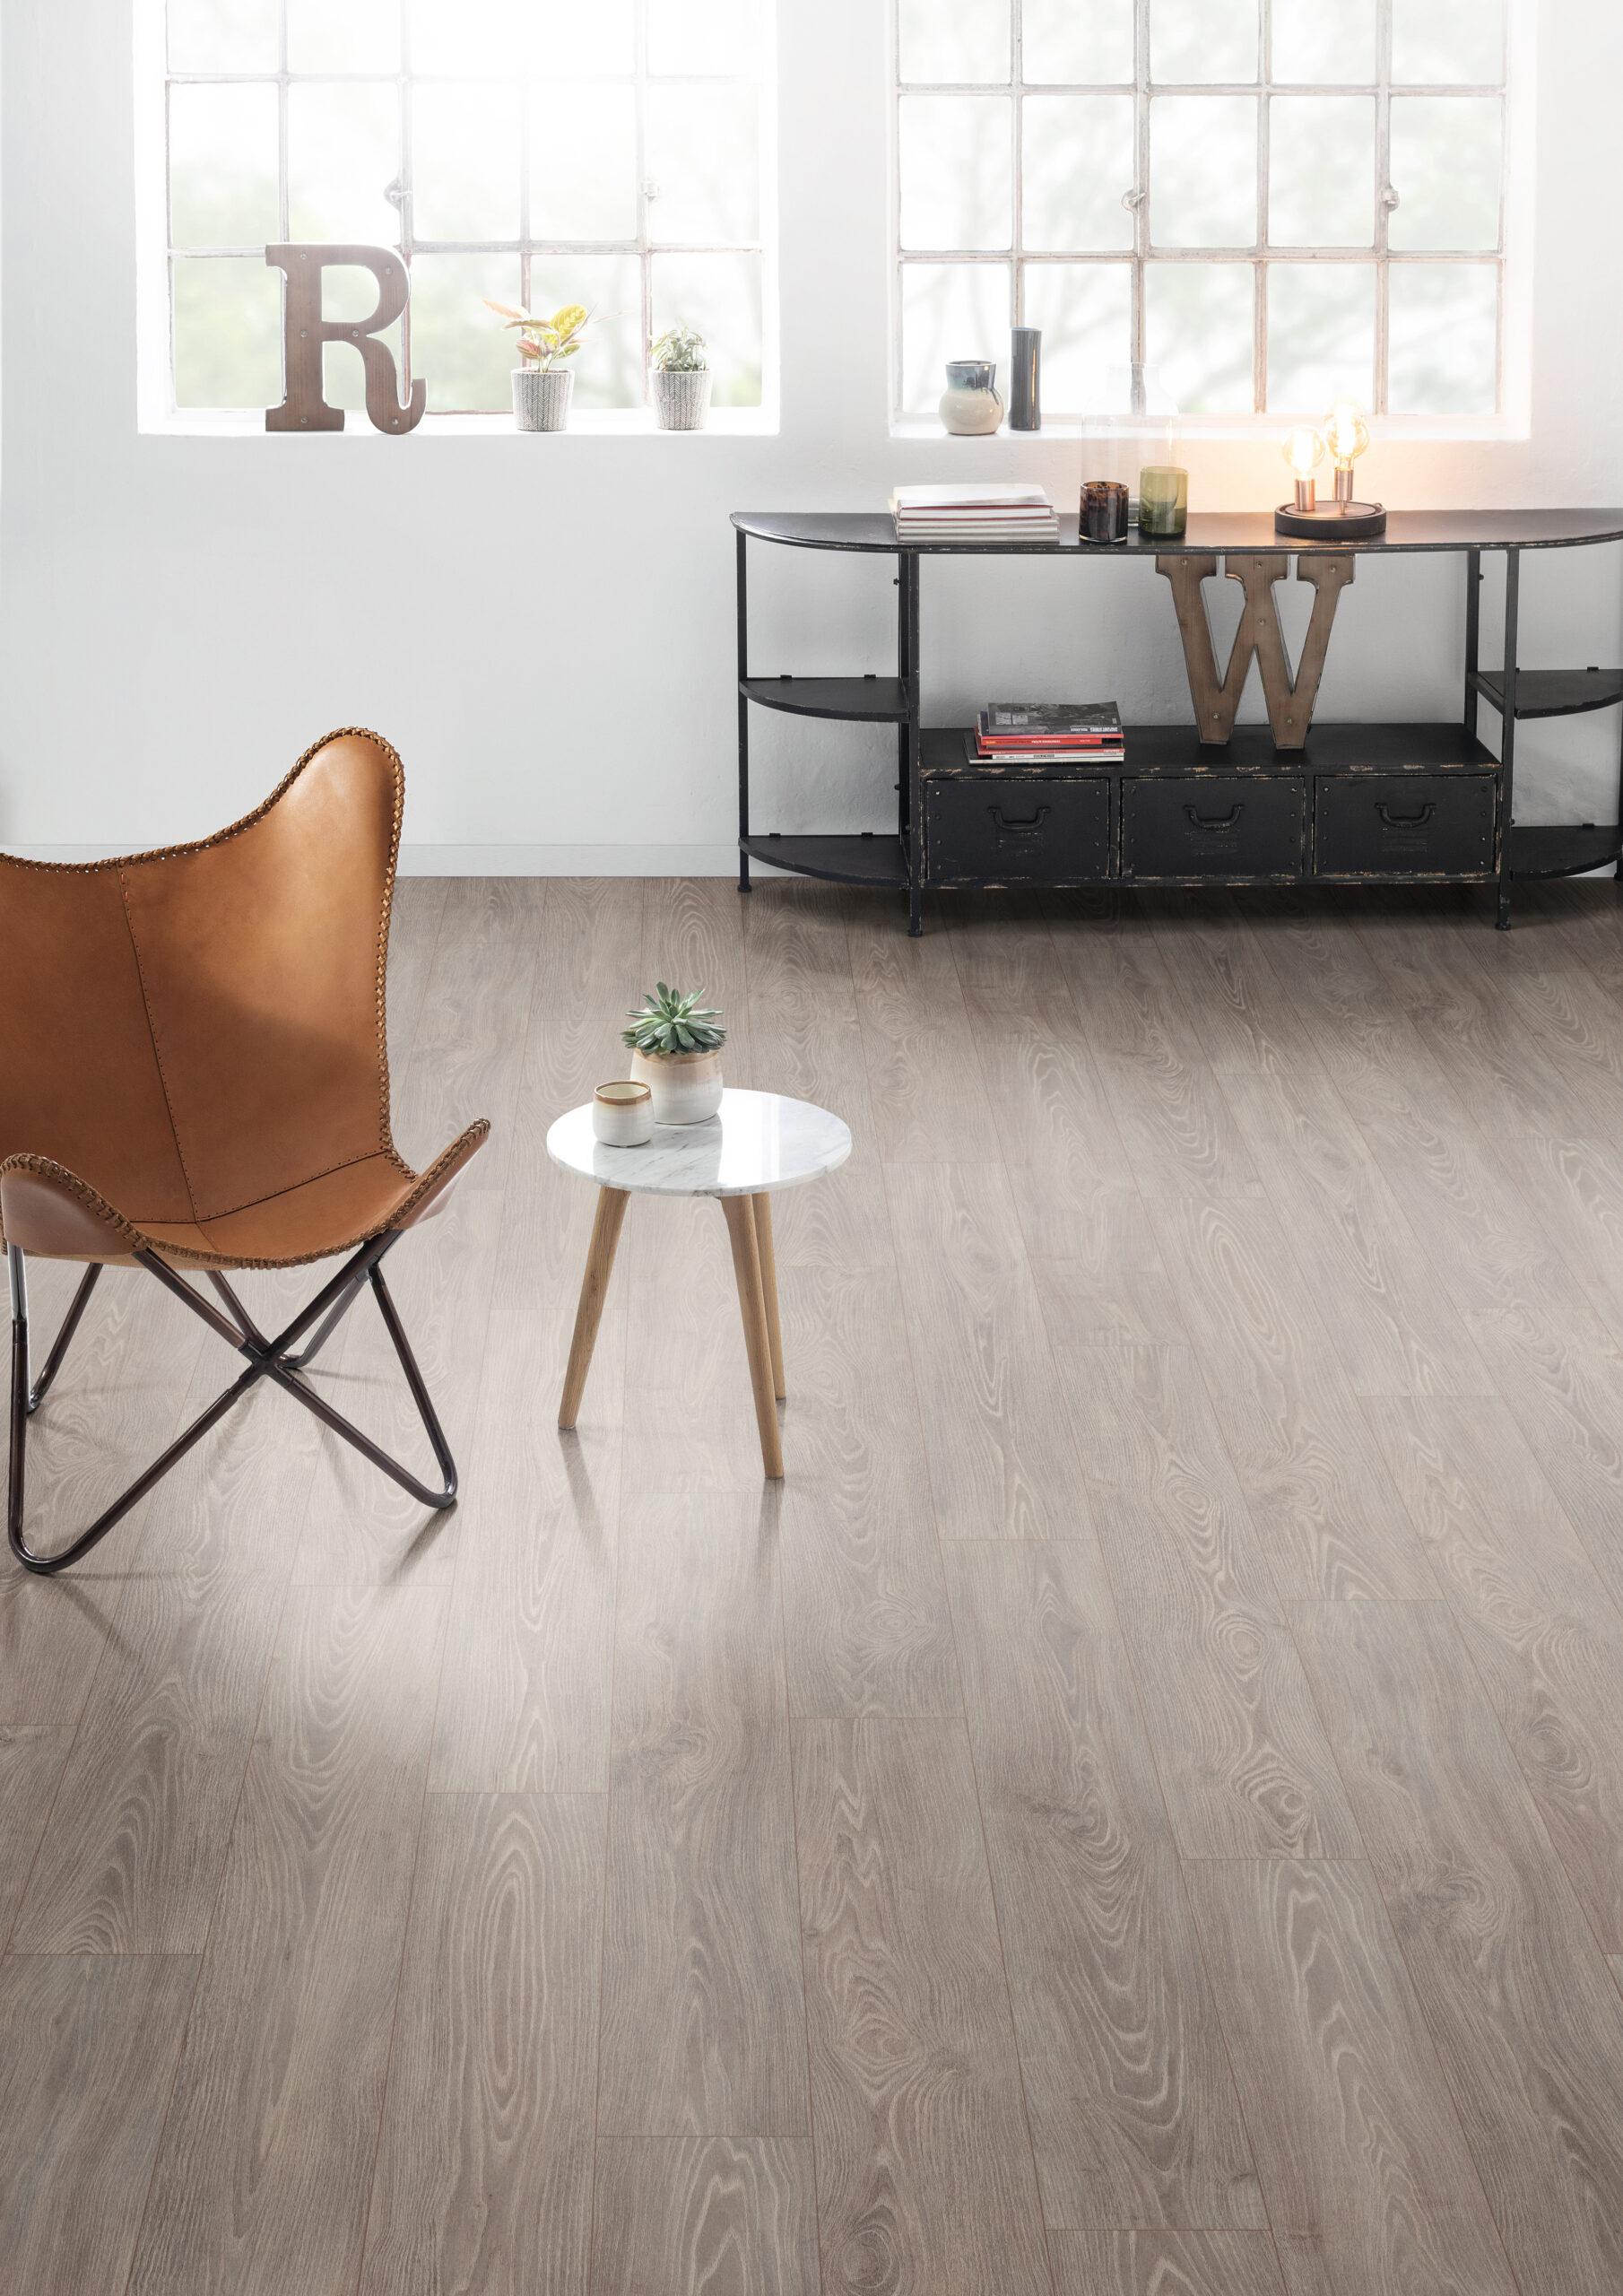 application;sideboard;chair;Living Area;Livingroom;window;table;flower